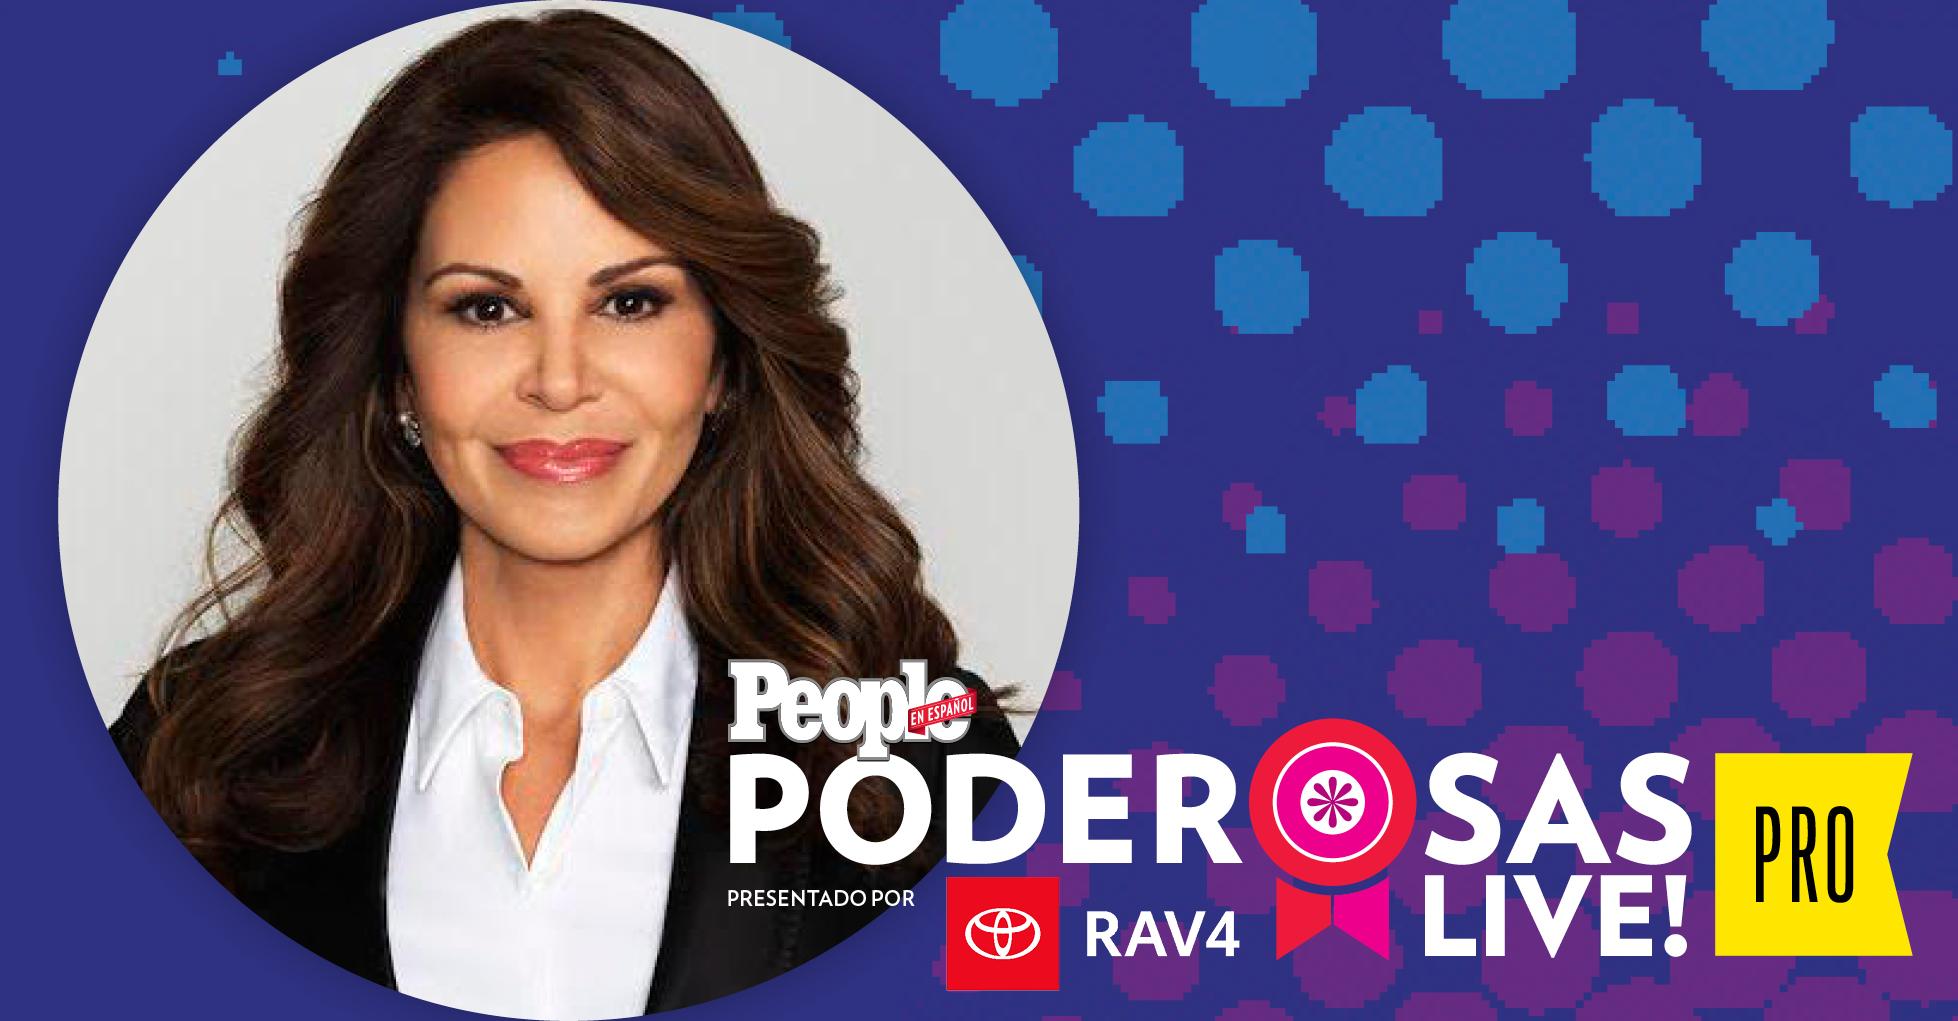 PODEROSAS 2019/PEOPLE EN ESPANOL